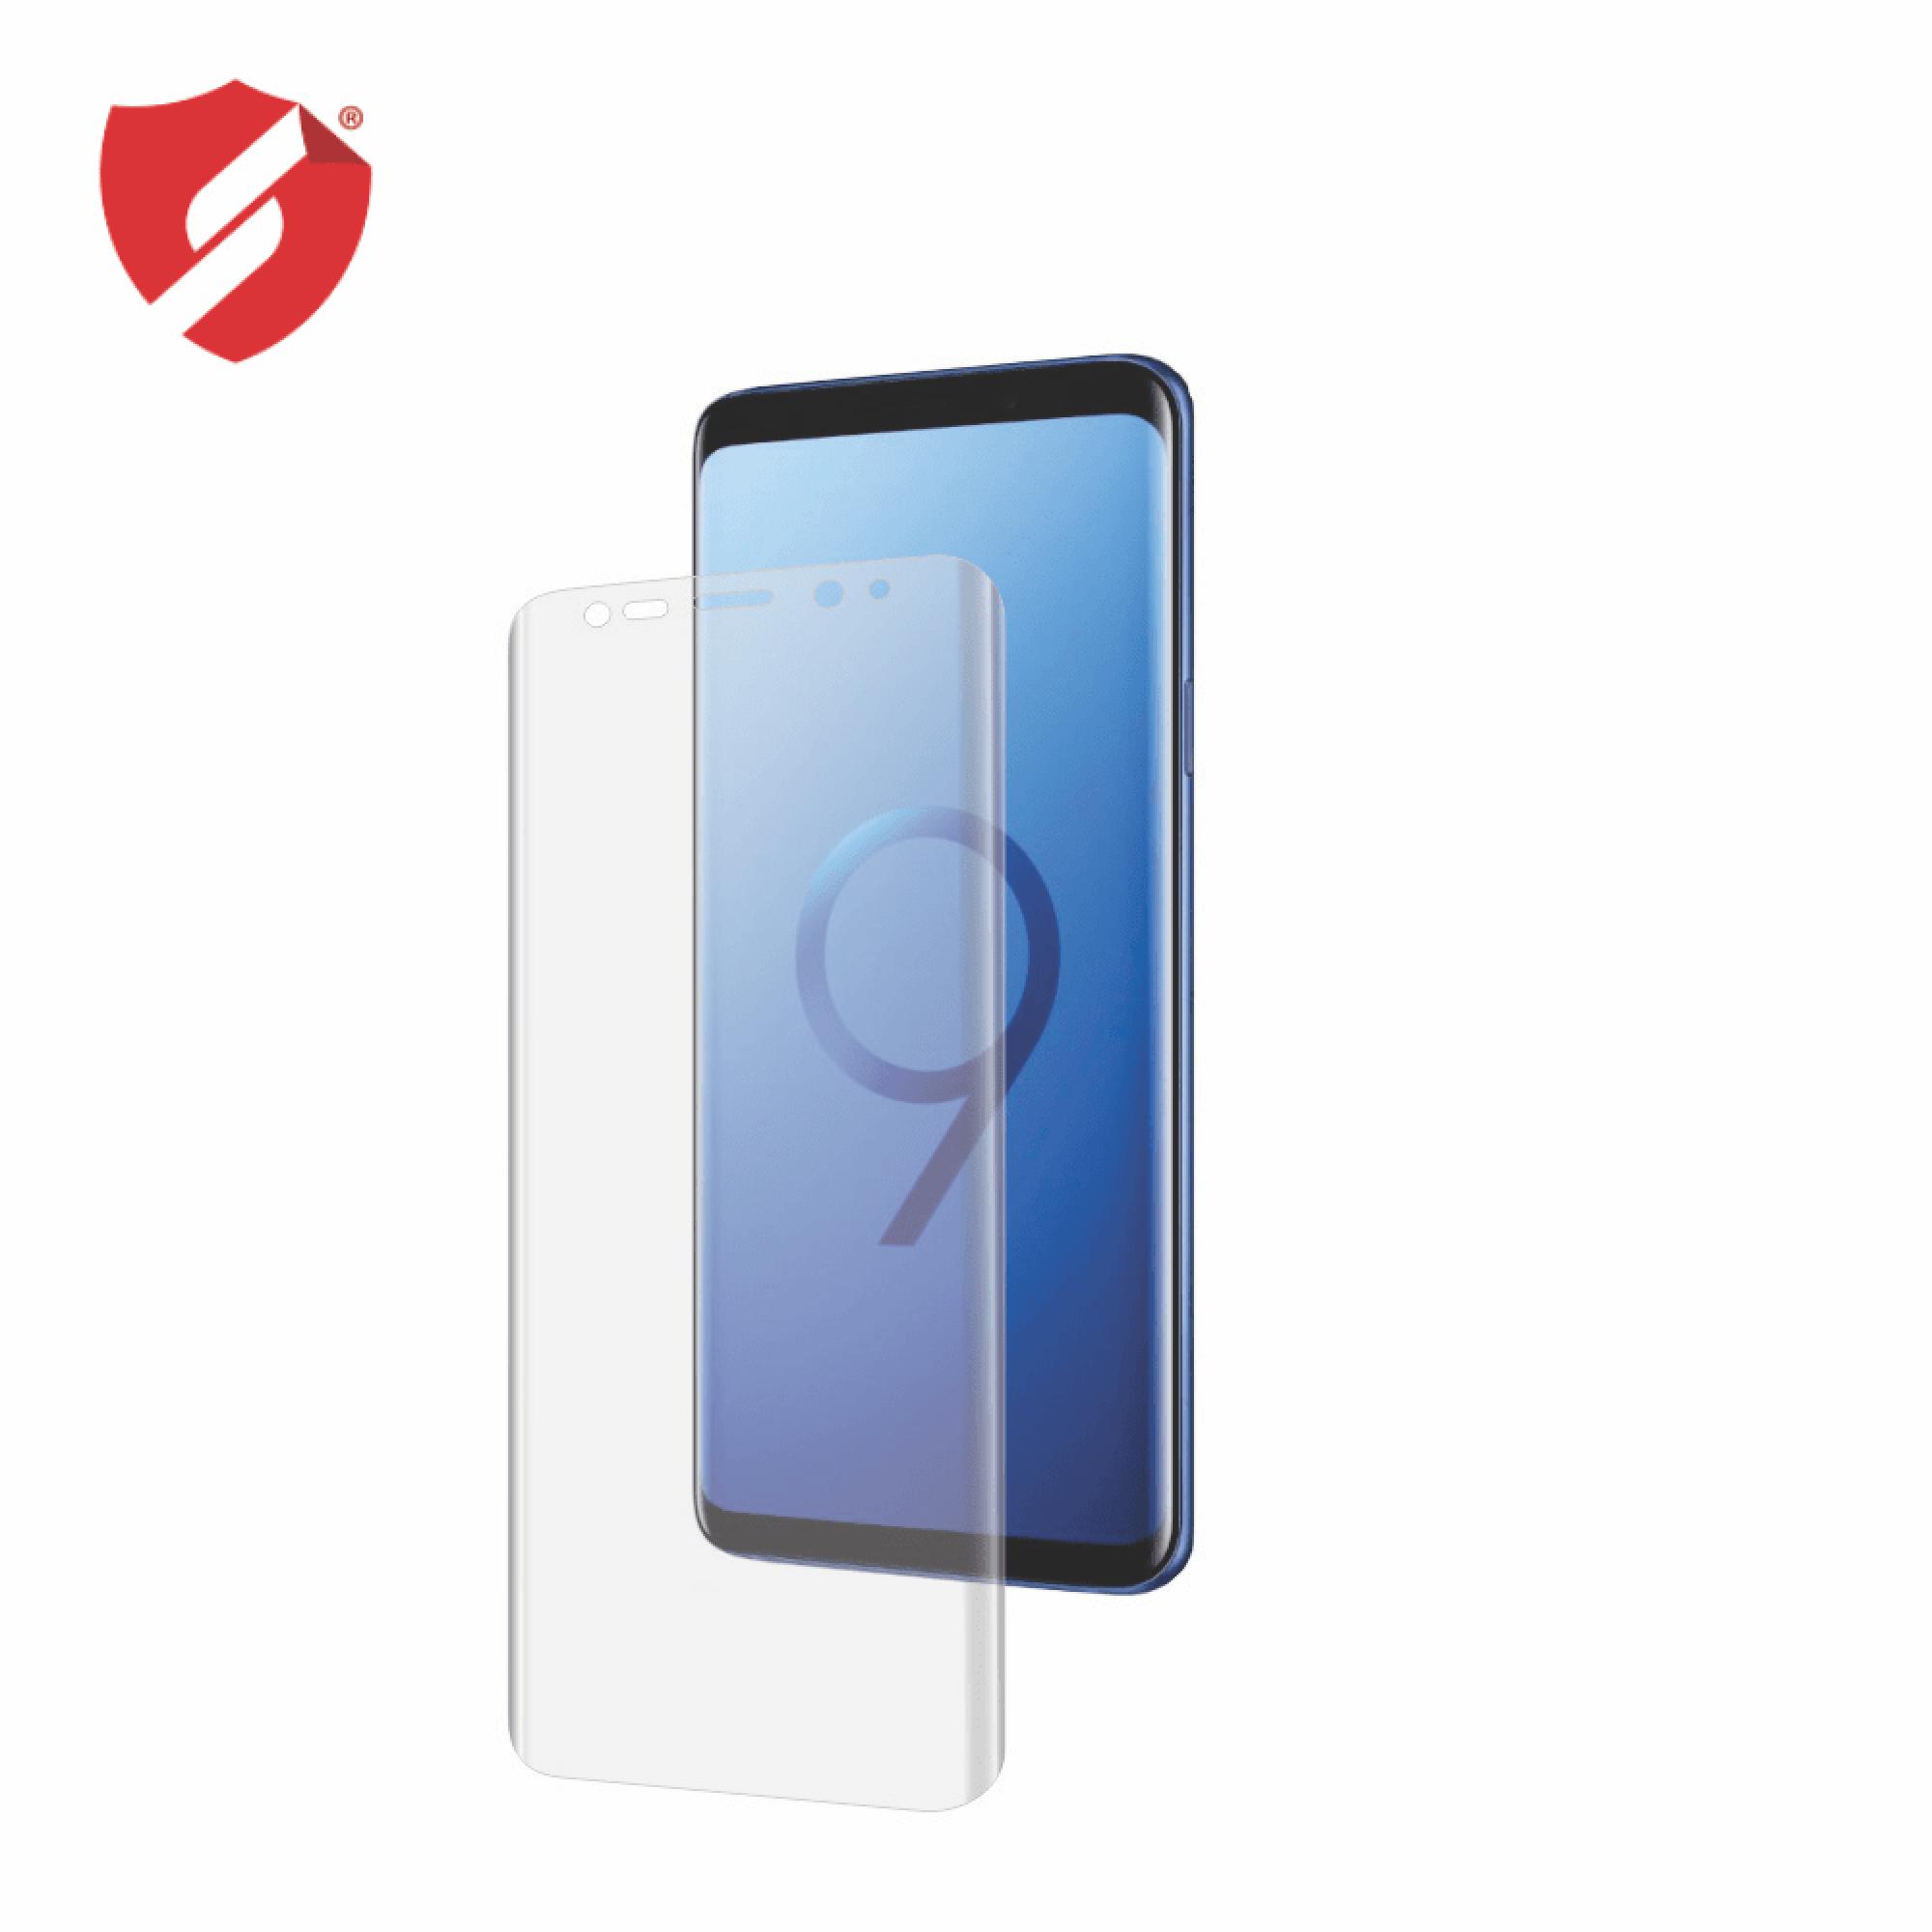 Folie de protectie Smart Protection Samsung Galaxy S9 Plus compatibila cu carcasa Nillkin Frosted - doar-display imagine